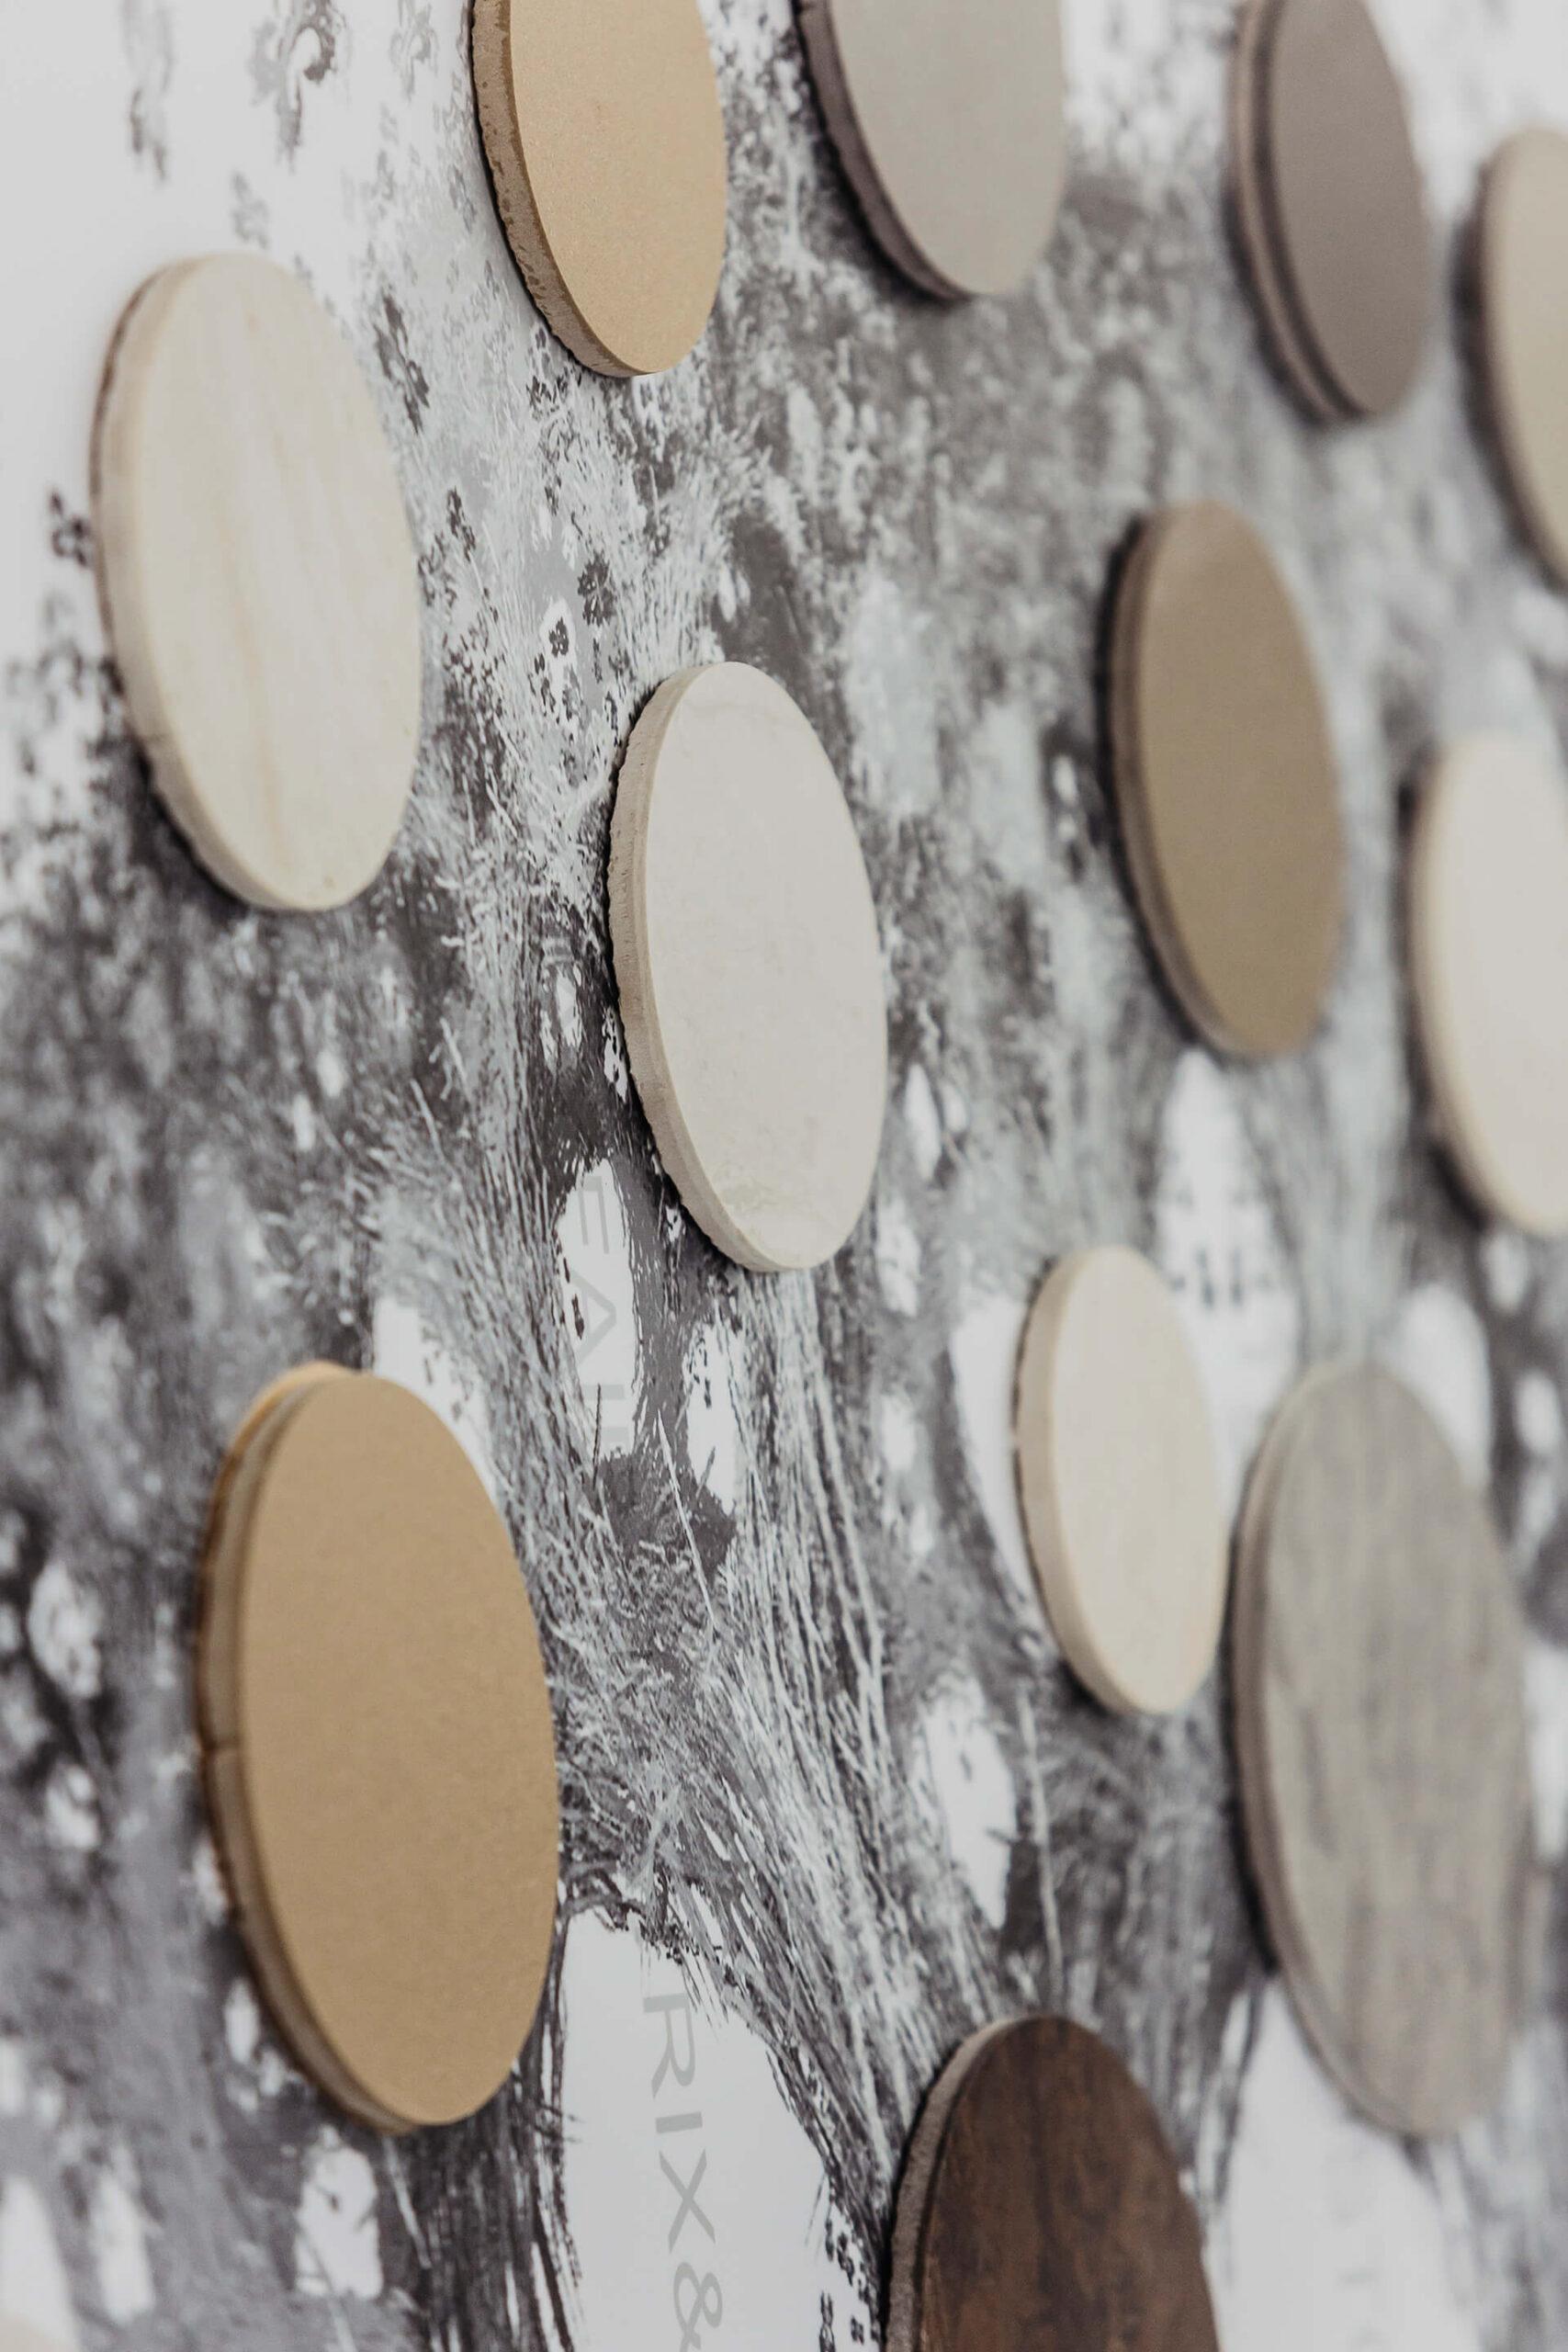 Allestimenti Grafox - Fiere & Eventi - Ceramica Galassia - BODE CERAMICA @CERSAIE - BOLOGNA